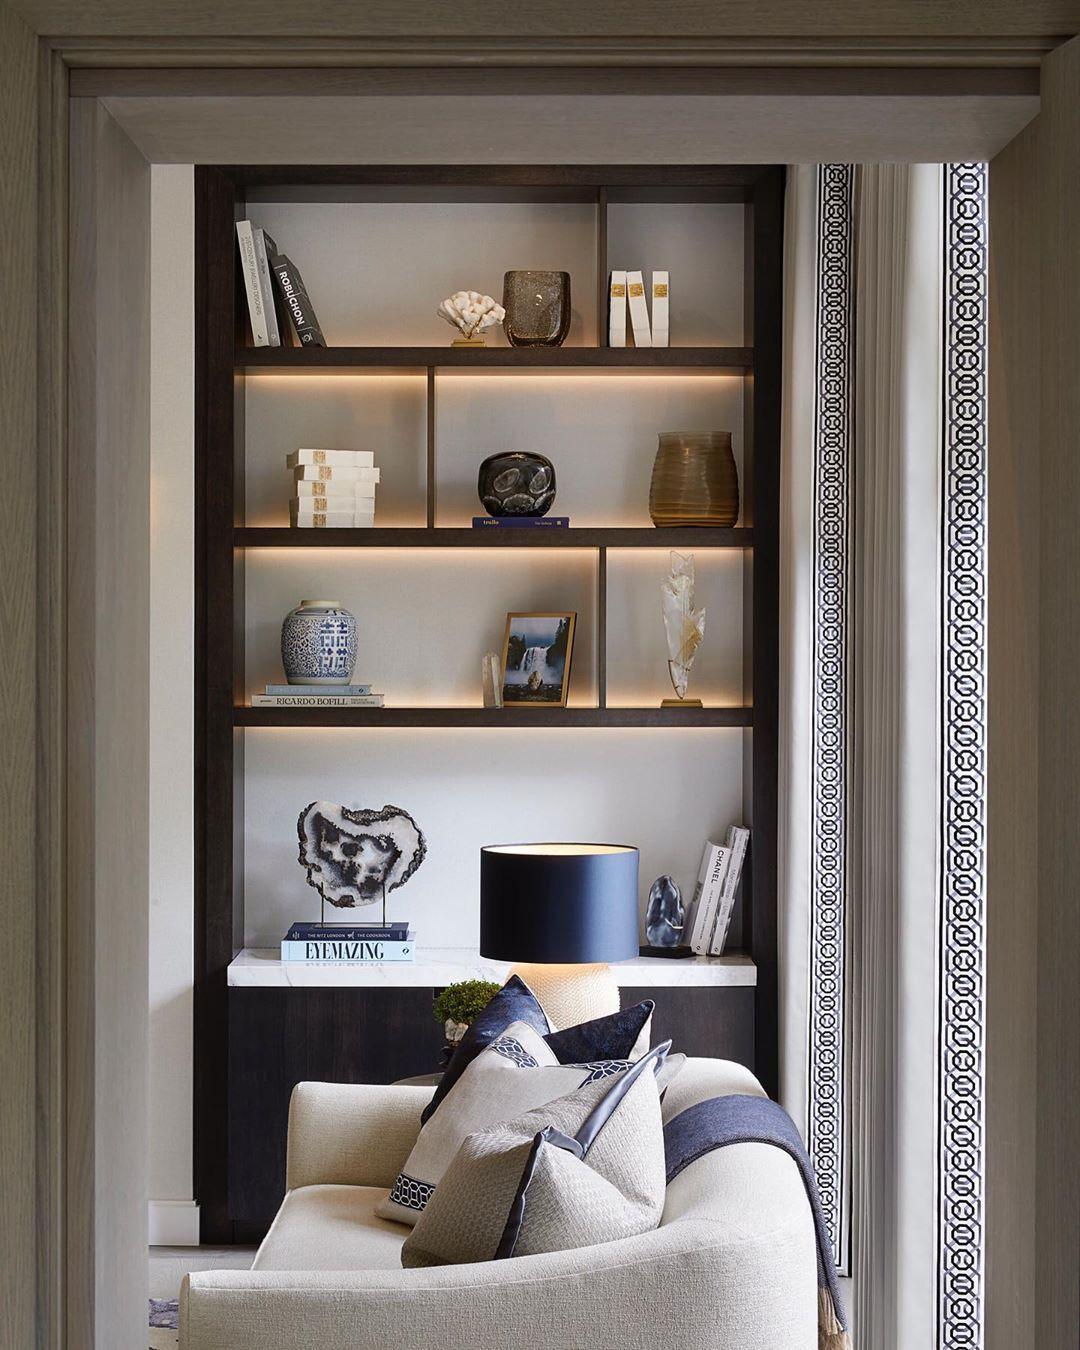 "3d Room Interior Design: Sophie Paterson On Instagram: ""We Just Got The Photos Back"